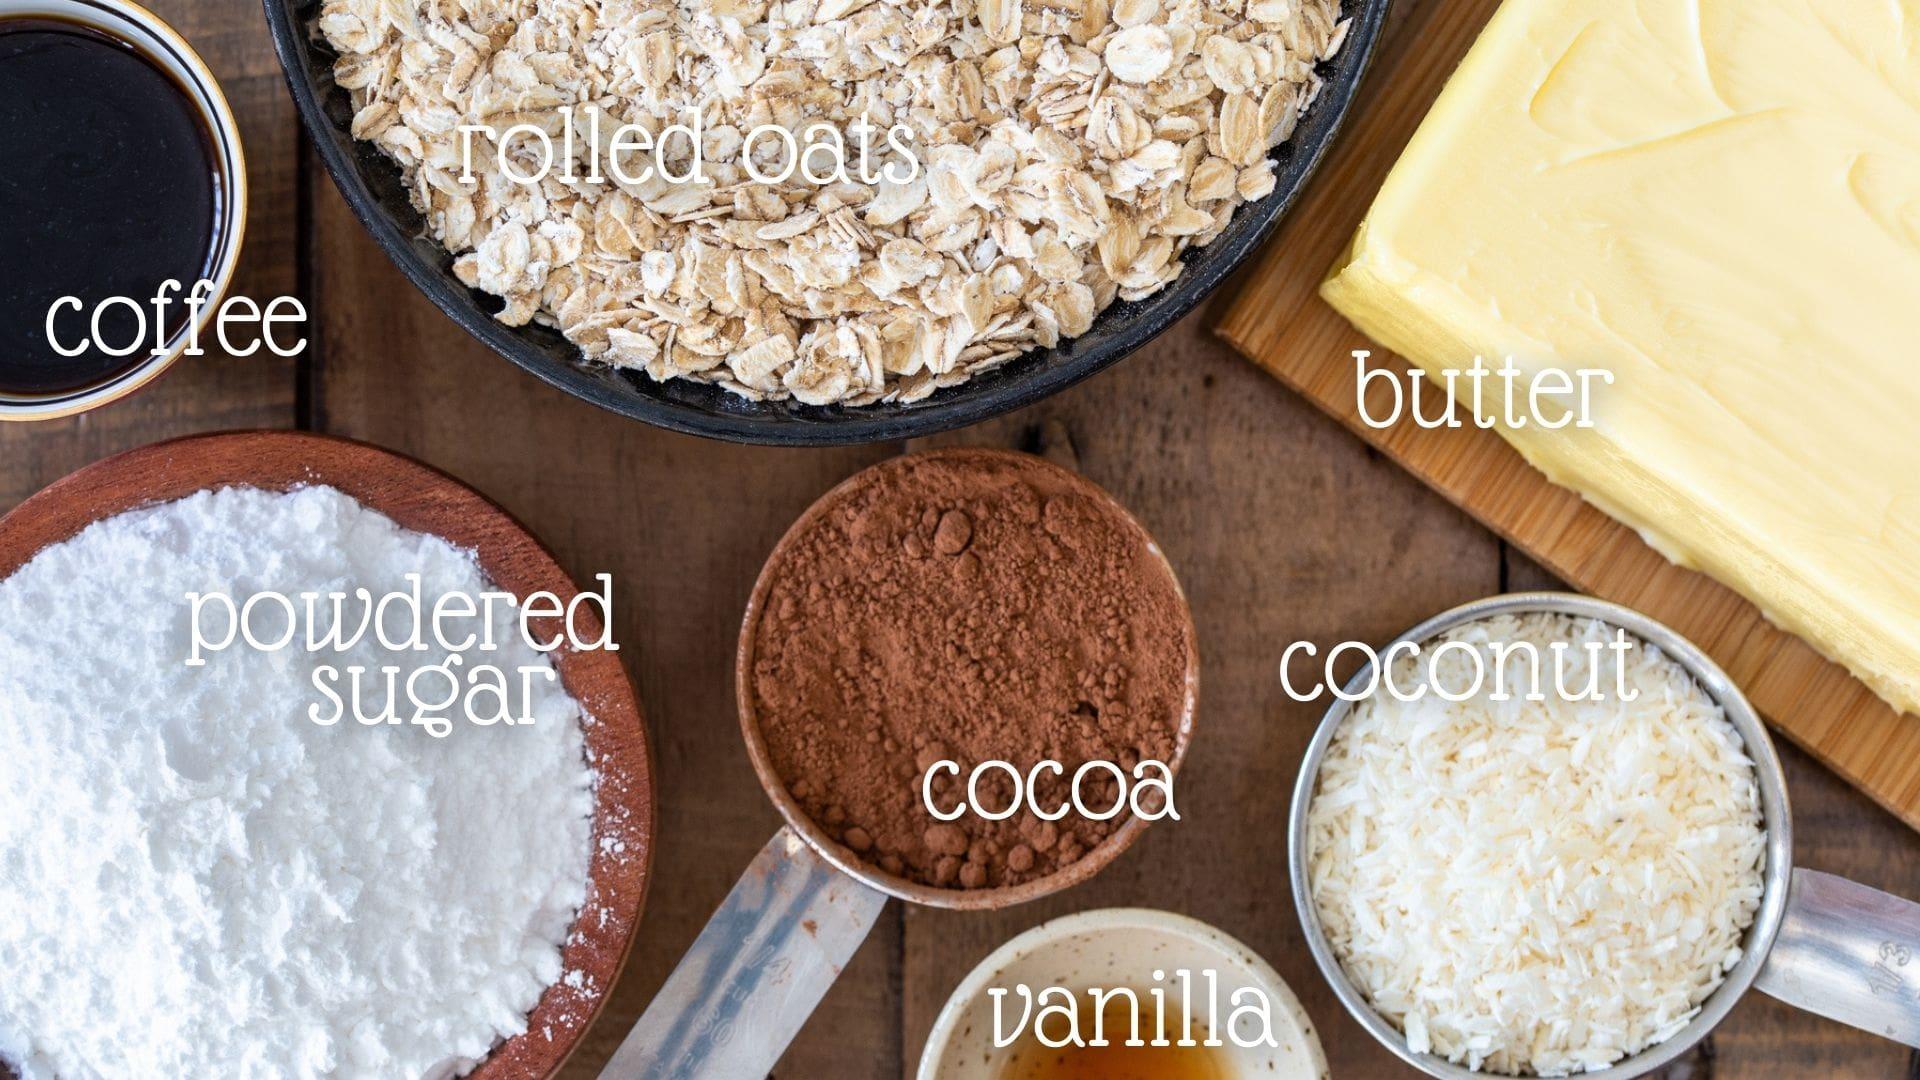 Chocolate balls ingredients.